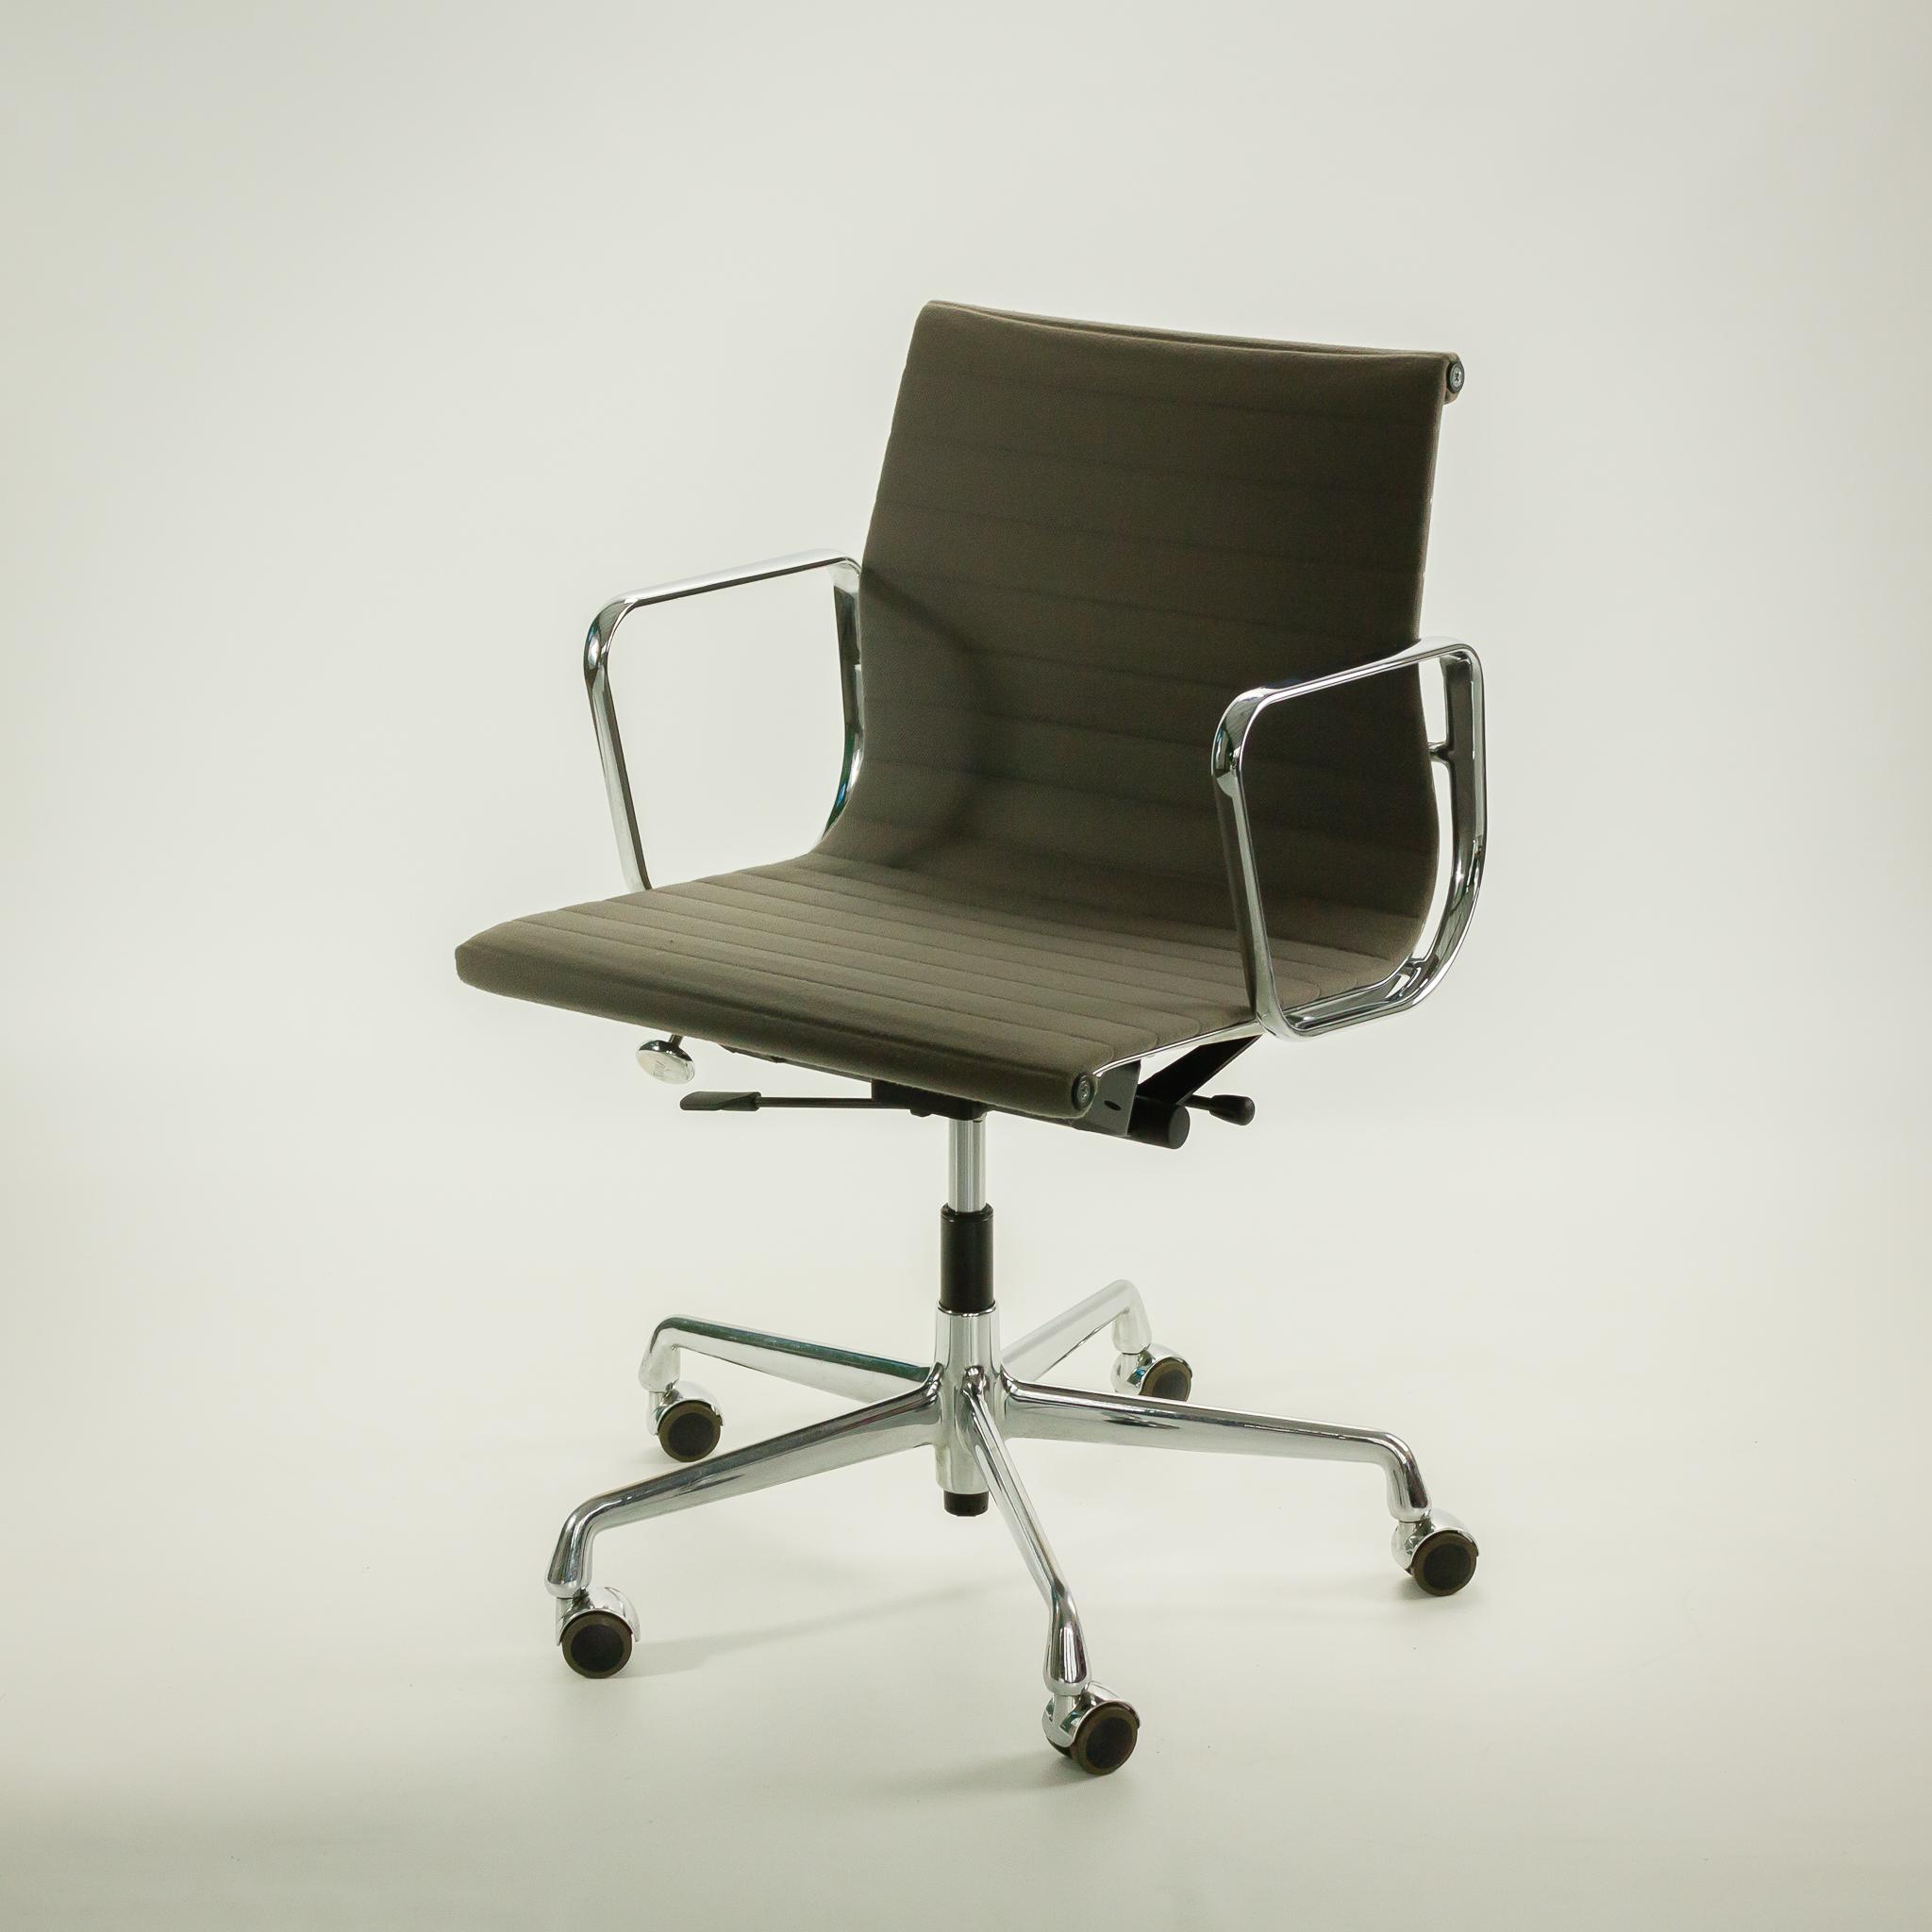 Eames Ea 117 Bureaustoel.50 S Eames Ea 117 Bureaustoel Door Vitra Barbmama